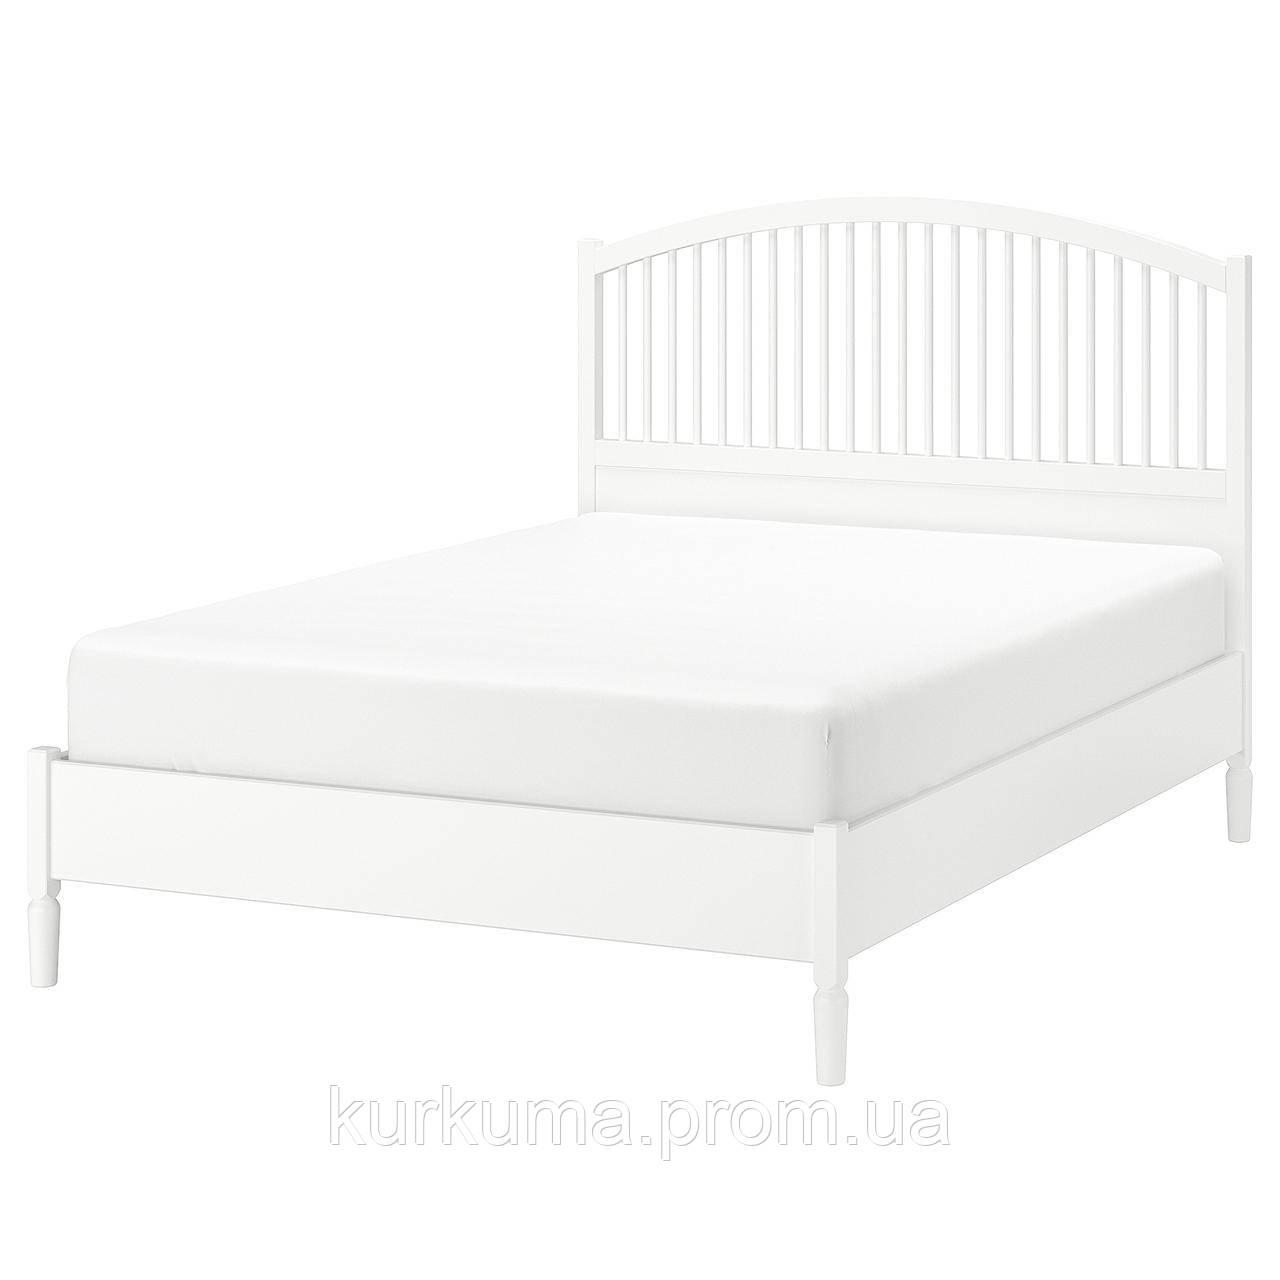 IKEA TYSSEDAL Кровать, белый, Лурой  (390.579.72)